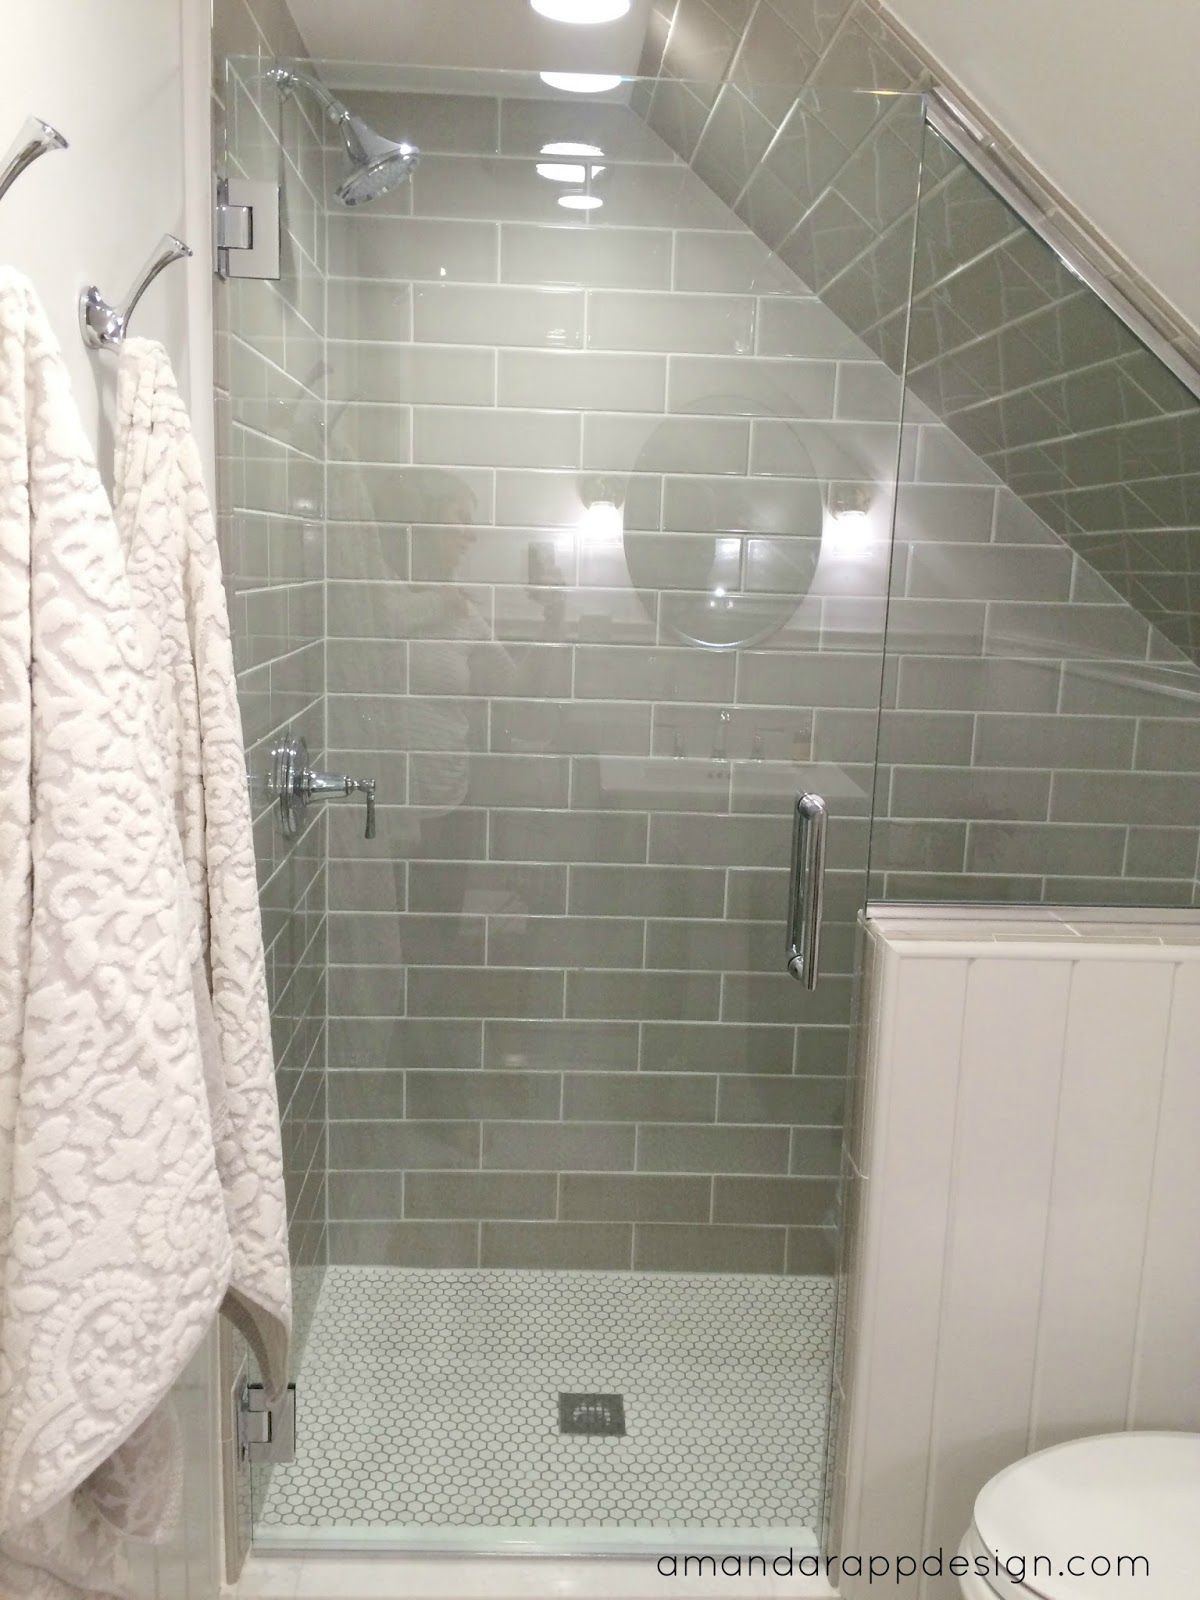 Delighted 12X24 Ceiling Tile Thick 1930S Floor Tiles Regular 24X24 Ceramic Tile 3X6 Subway Tile Backsplash Young 6X6 Ceramic Tile RedAllure Flooring Over Tile Slanted Ceiling, Taupe Subway Tile, Halfwall, Glass Door ..